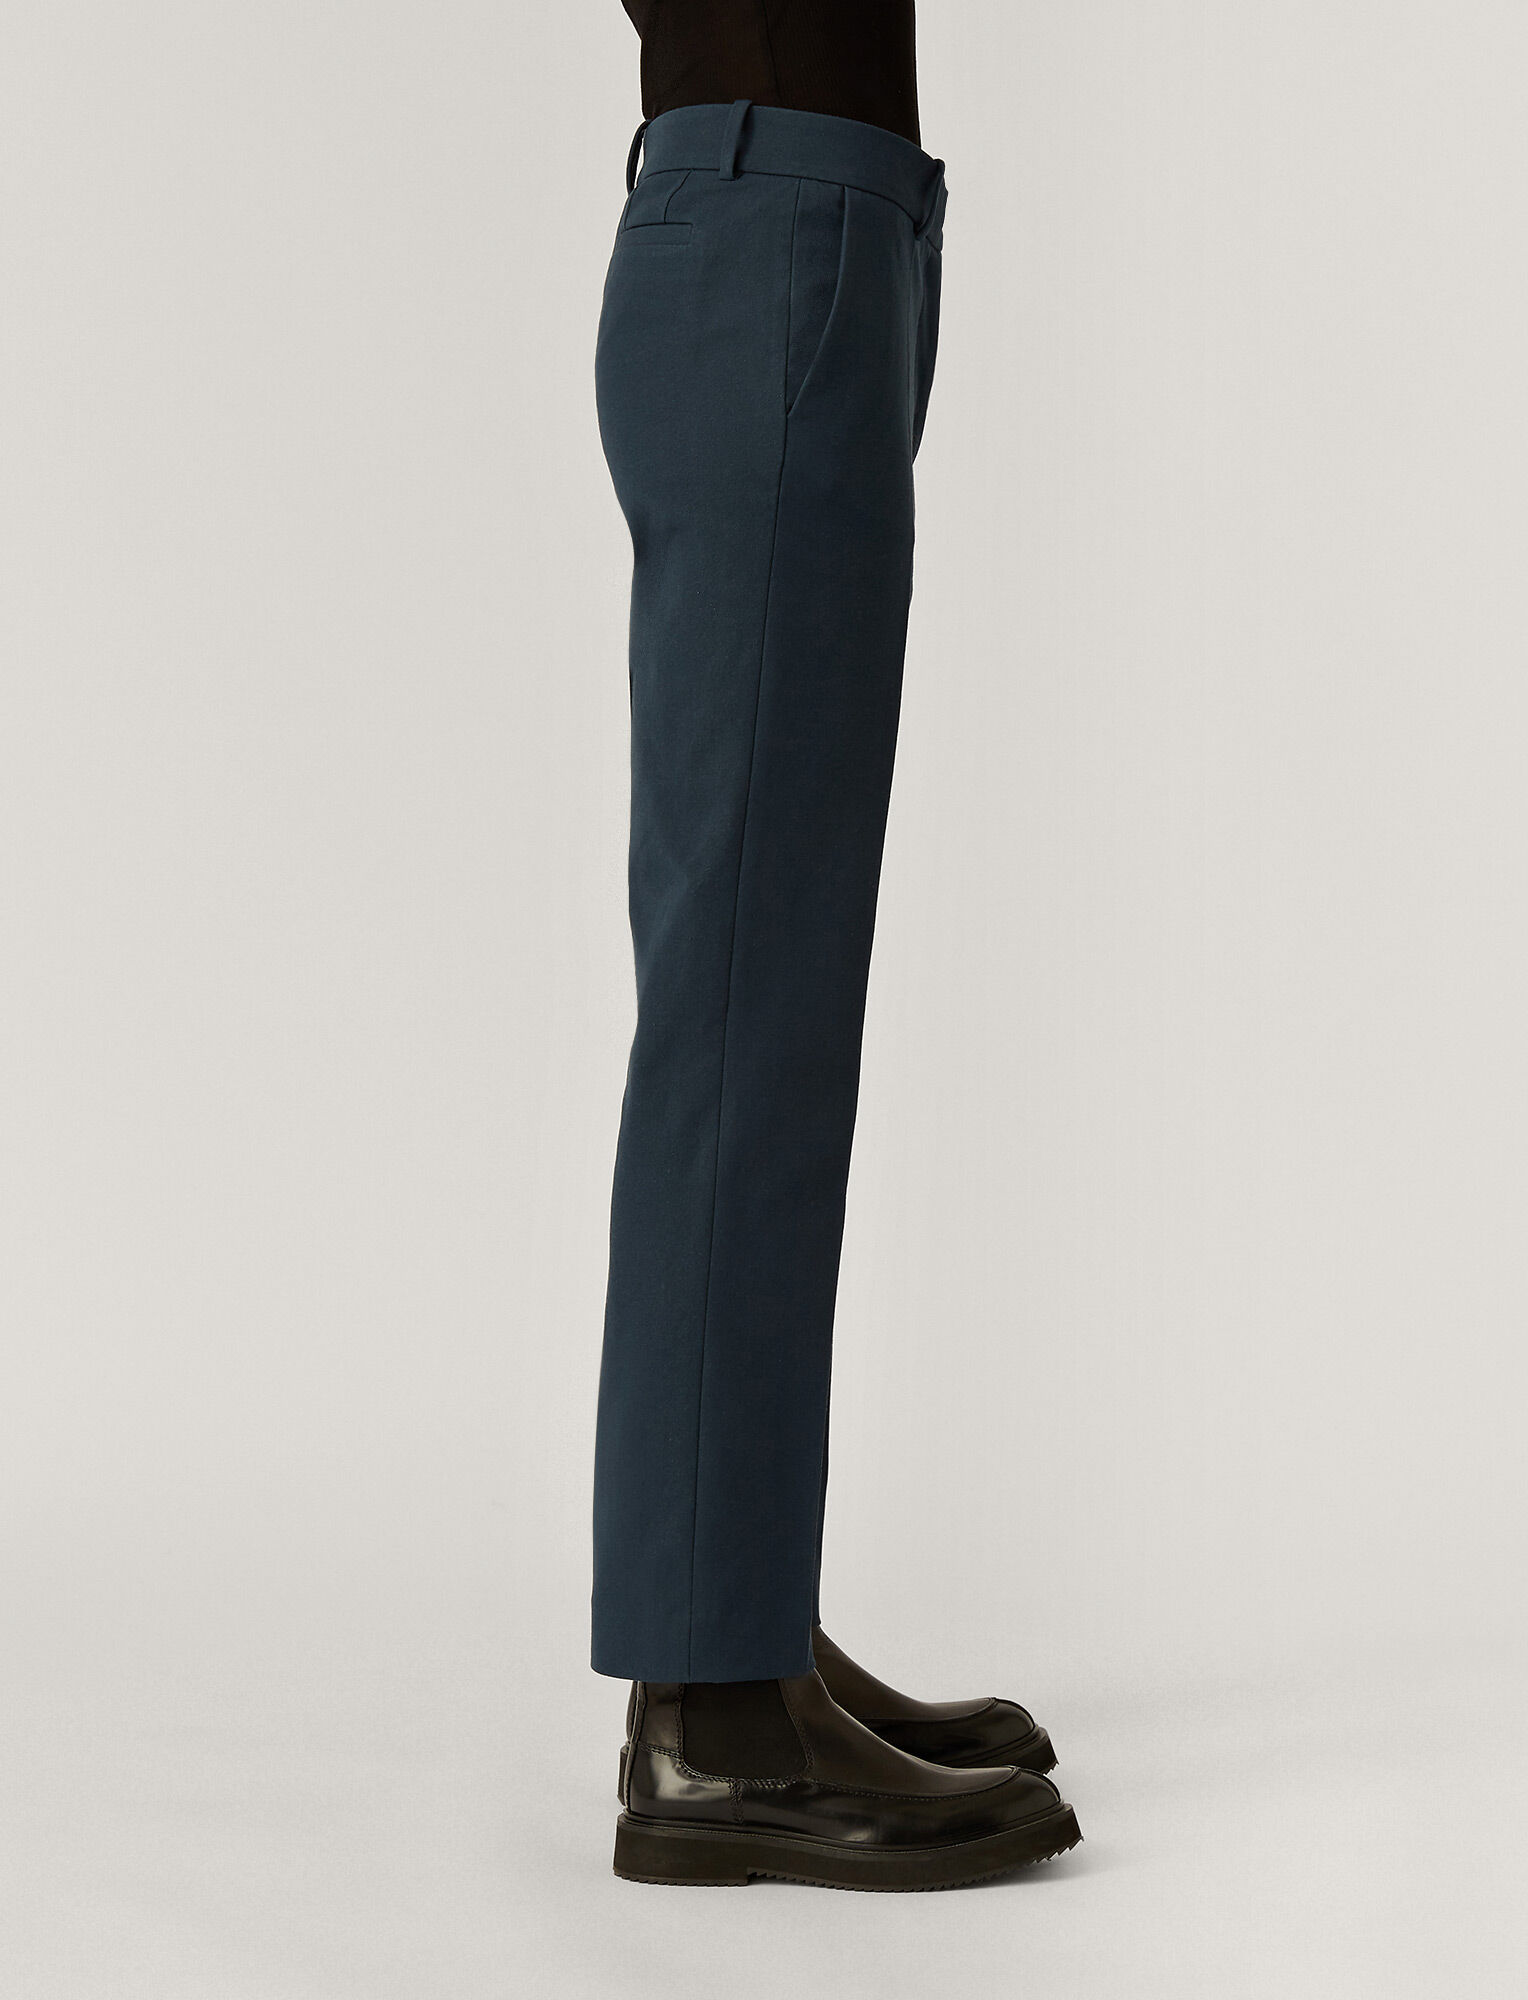 Joseph, Coleman Gabardine Stretch Trousers, in Petrol